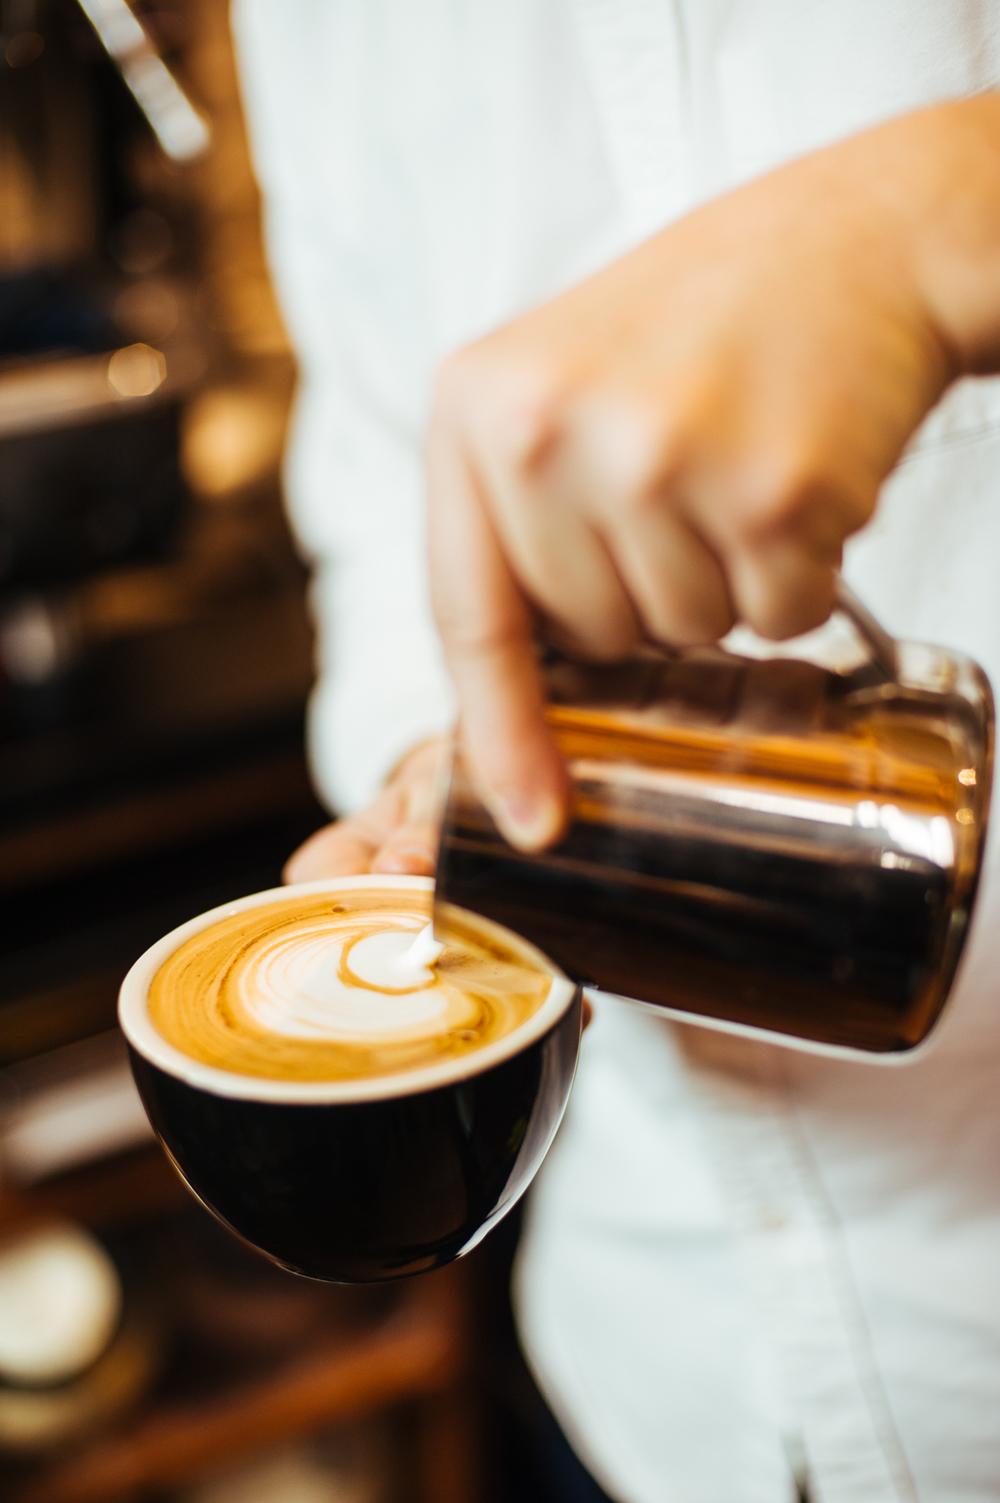 AllSaints Coffee Shop Leatherhead 2015-65.JPG